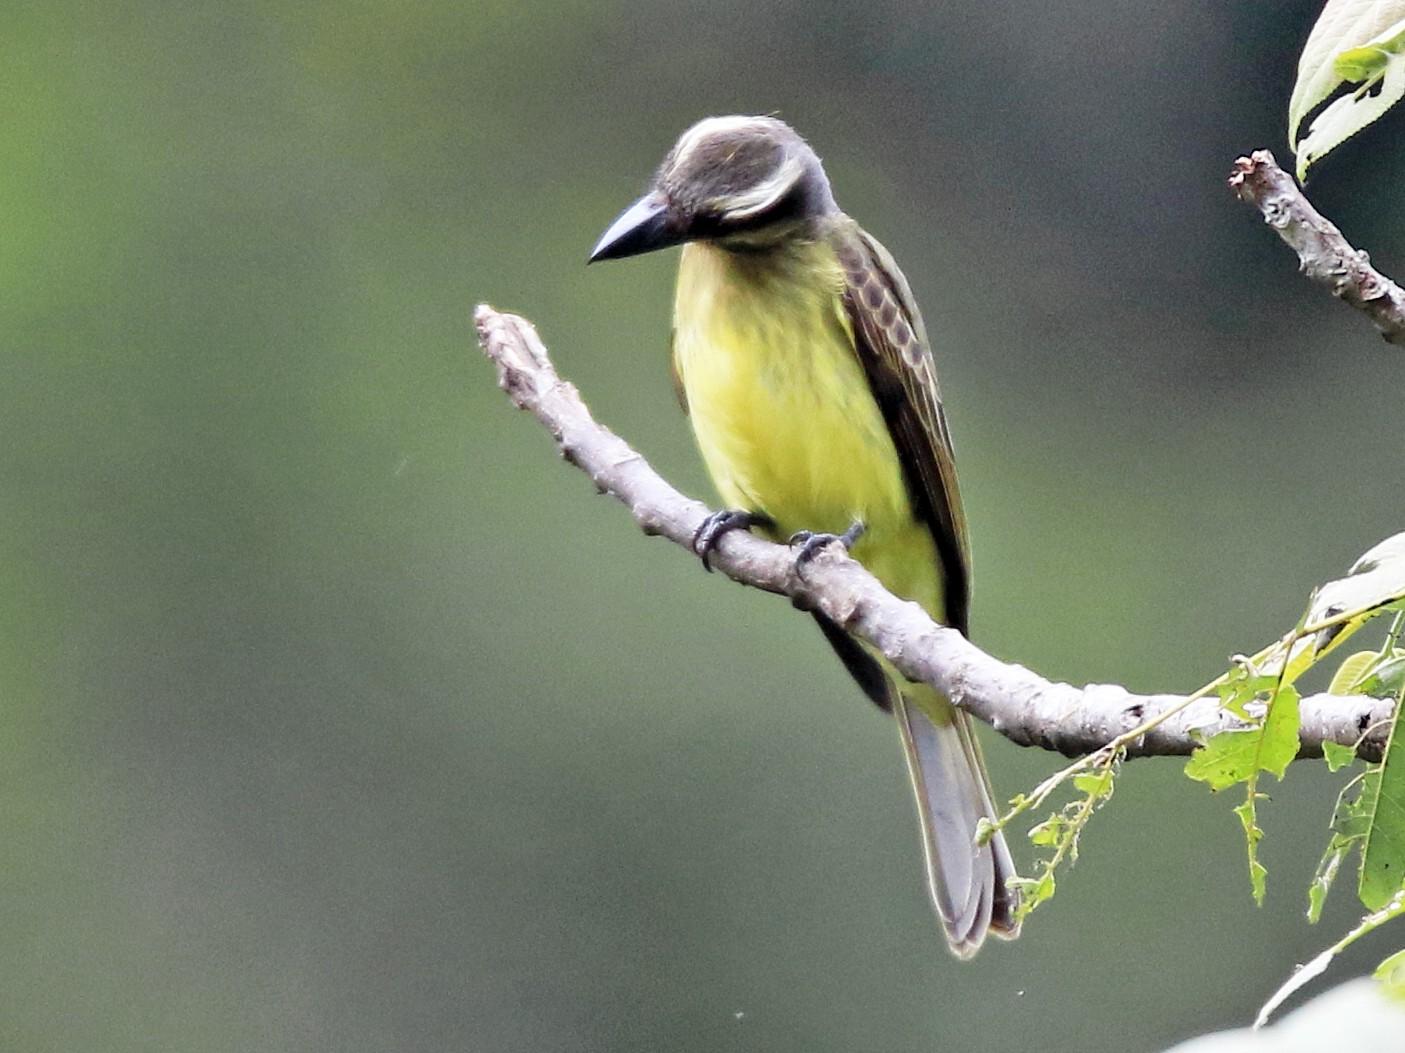 Golden-crowned Flycatcher - William Legge